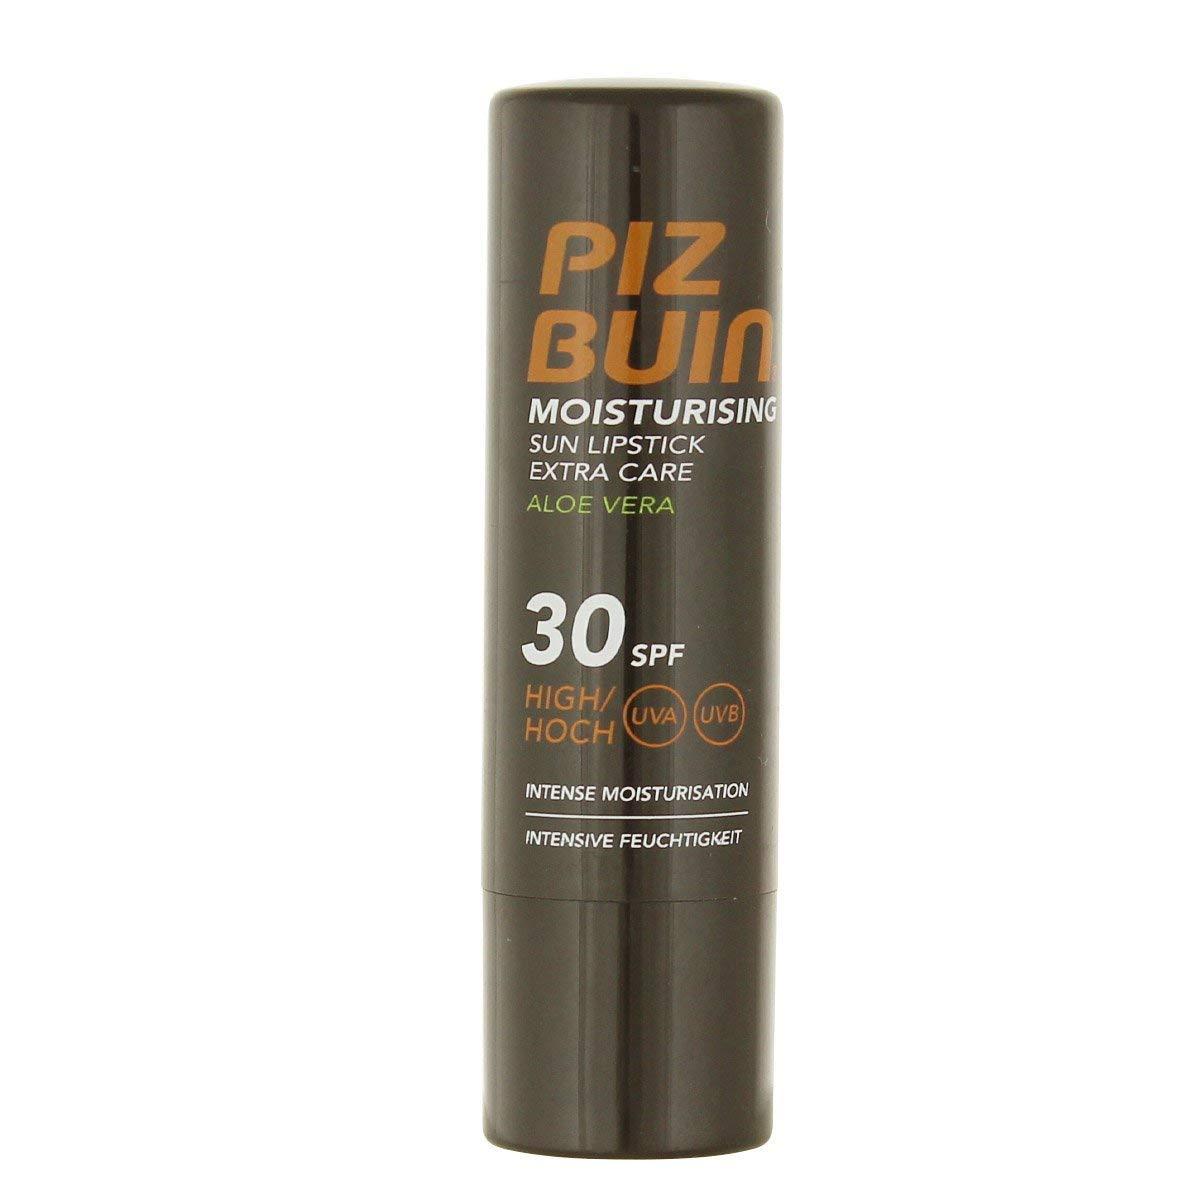 4 x Piz Buin Moisturising Sun Lipstick Extra Care Aloe Vera SPF30 4.9g